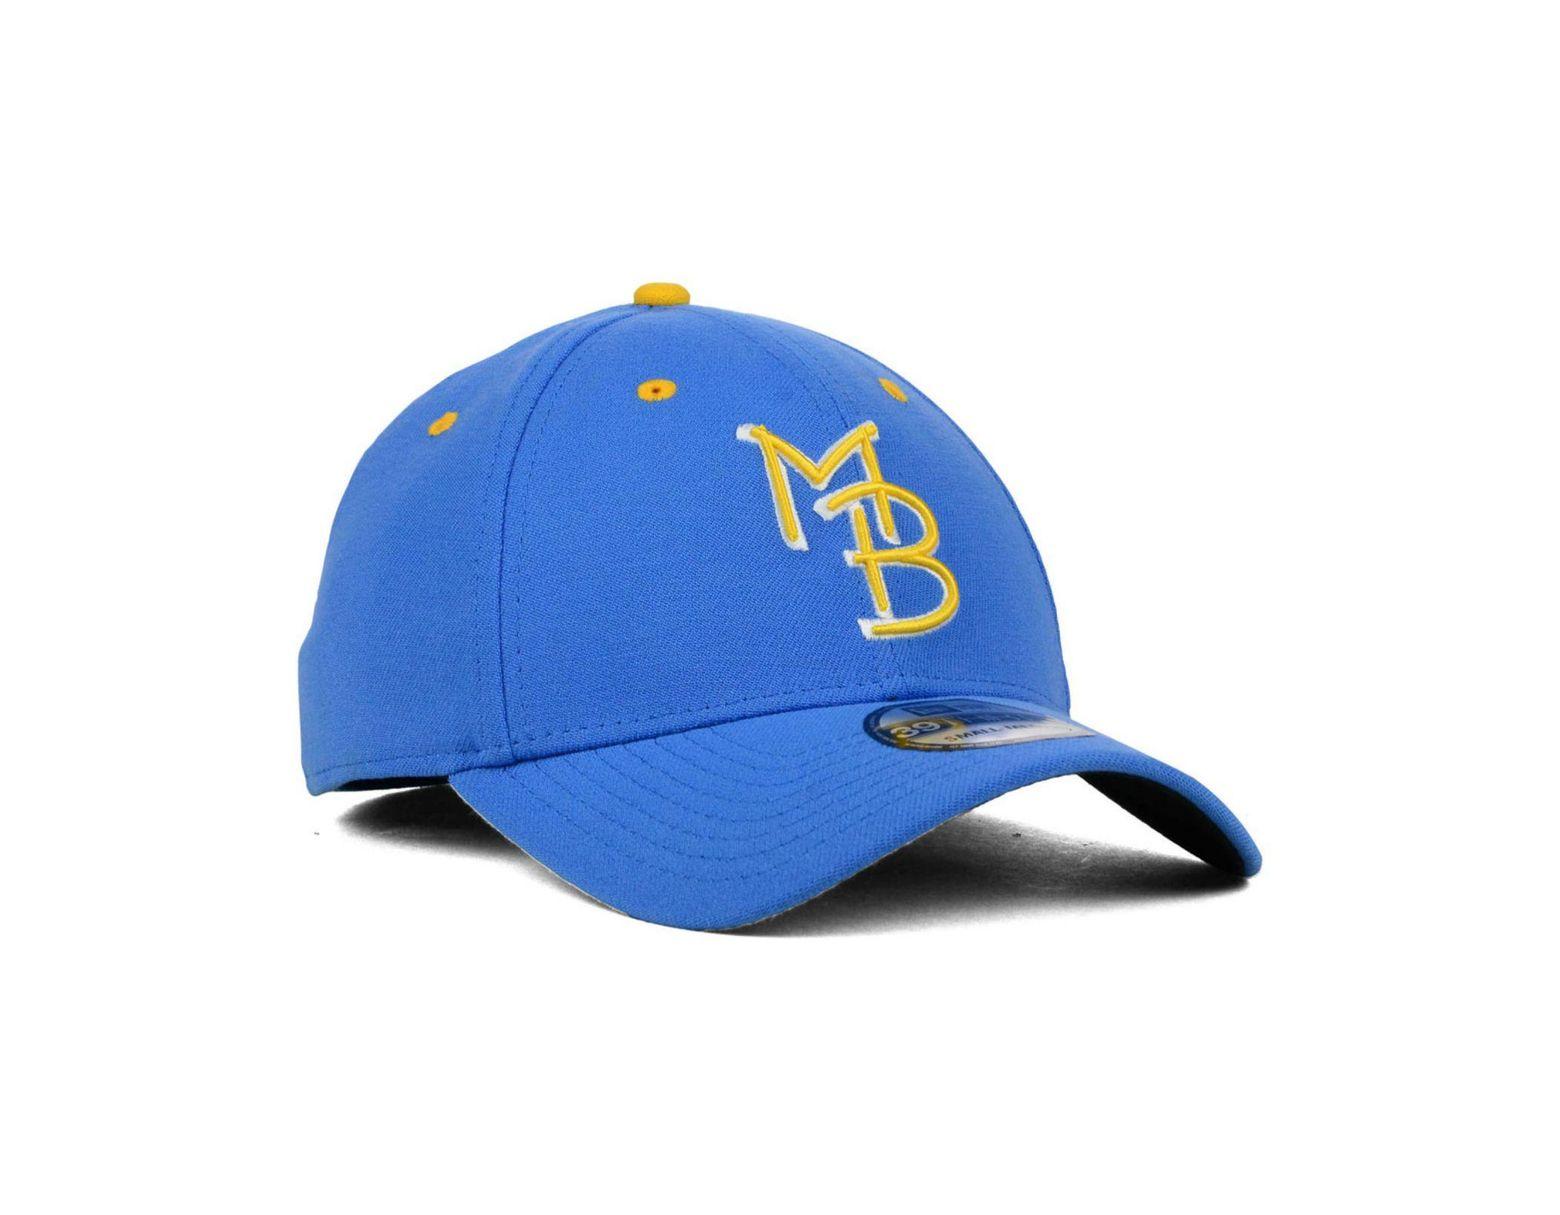 77feeb43b92e4 KTZ Myrtle Beach Pelicans 39thirty Cap in Blue for Men - Save 6% - Lyst